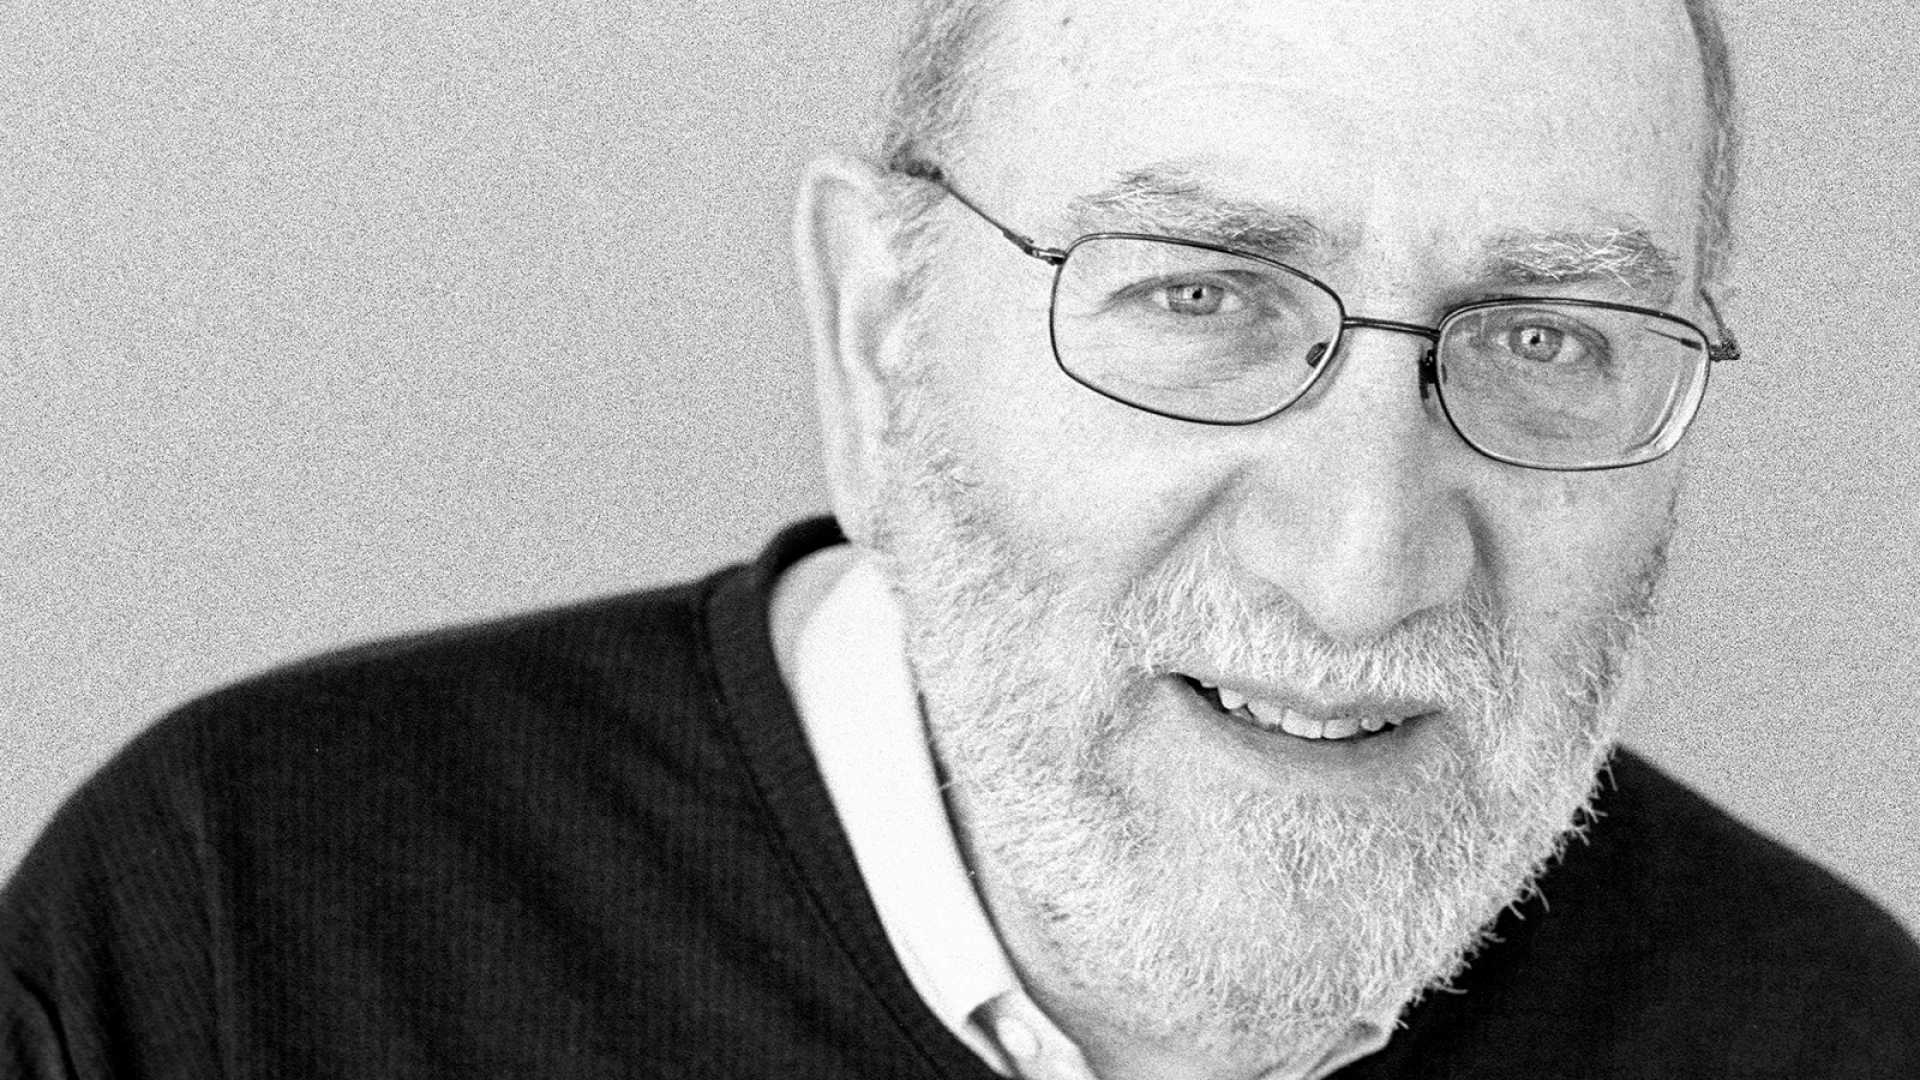 Paul Tasner, founder of PulpWorks.